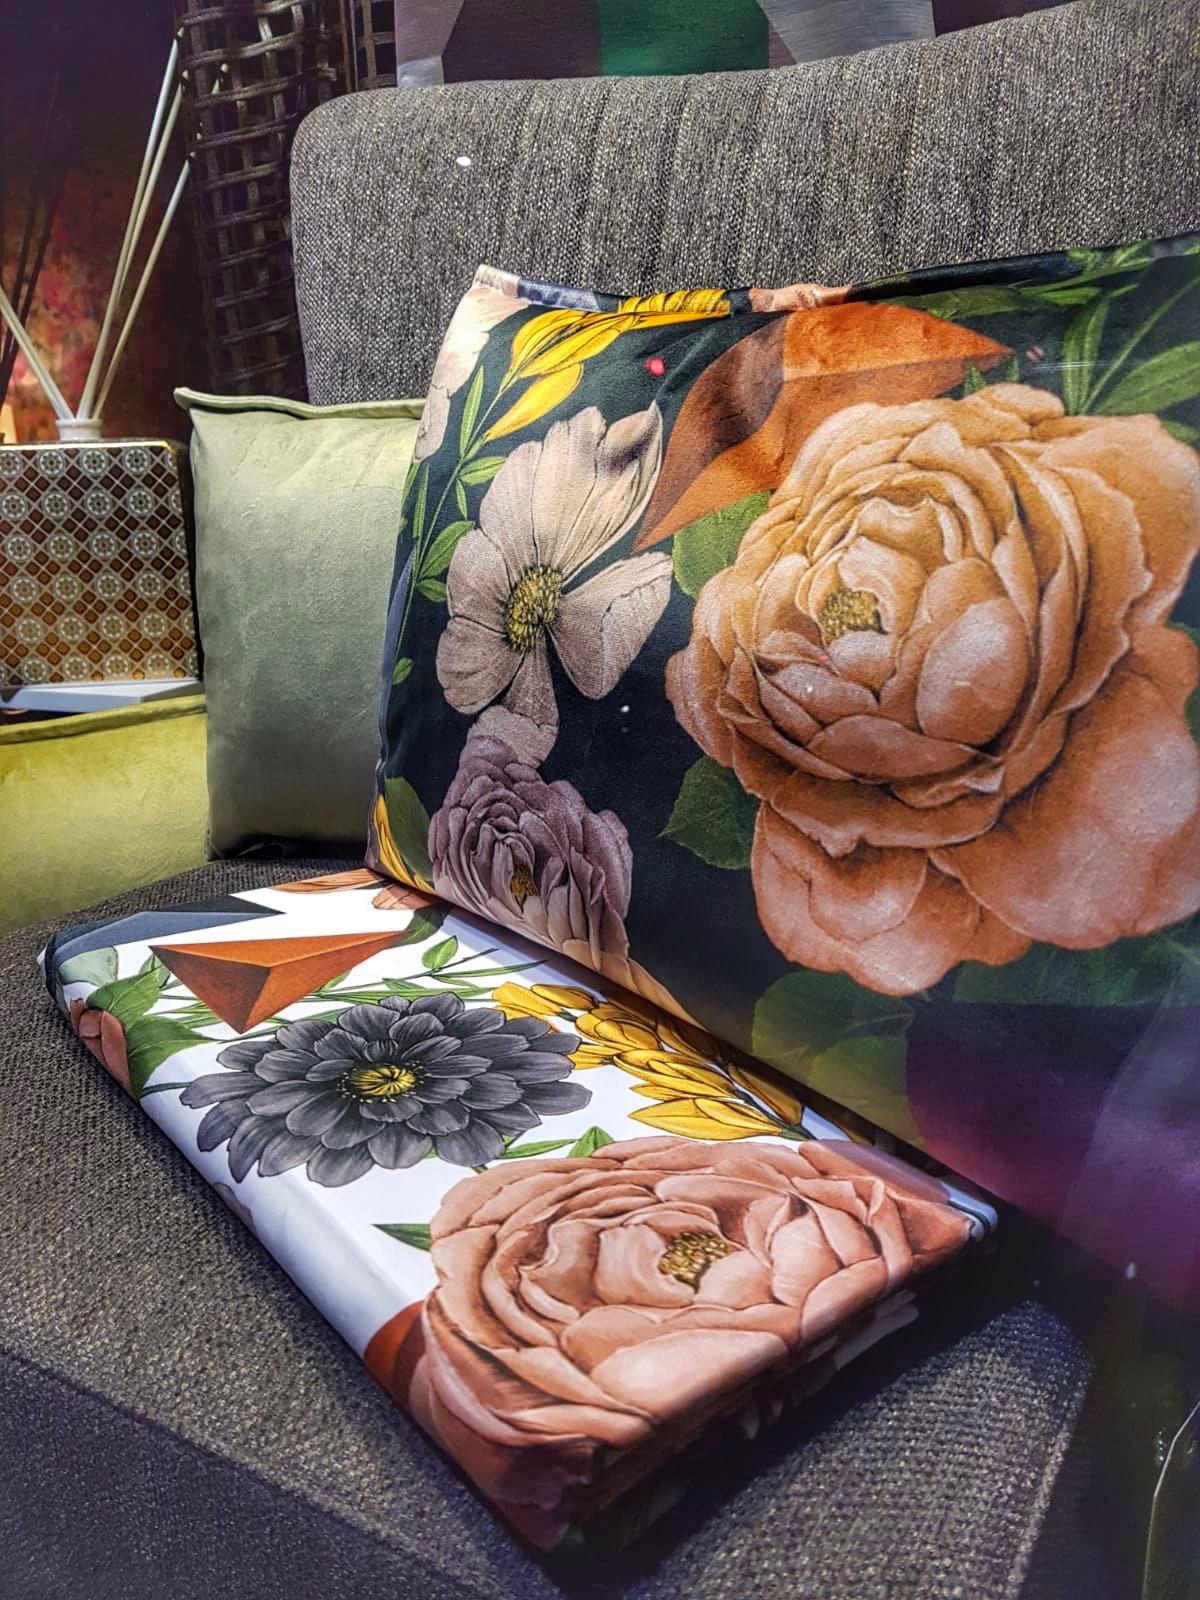 sara-rombola-pink-house-arredatrice-interior-designer-torino-talentieventi-9